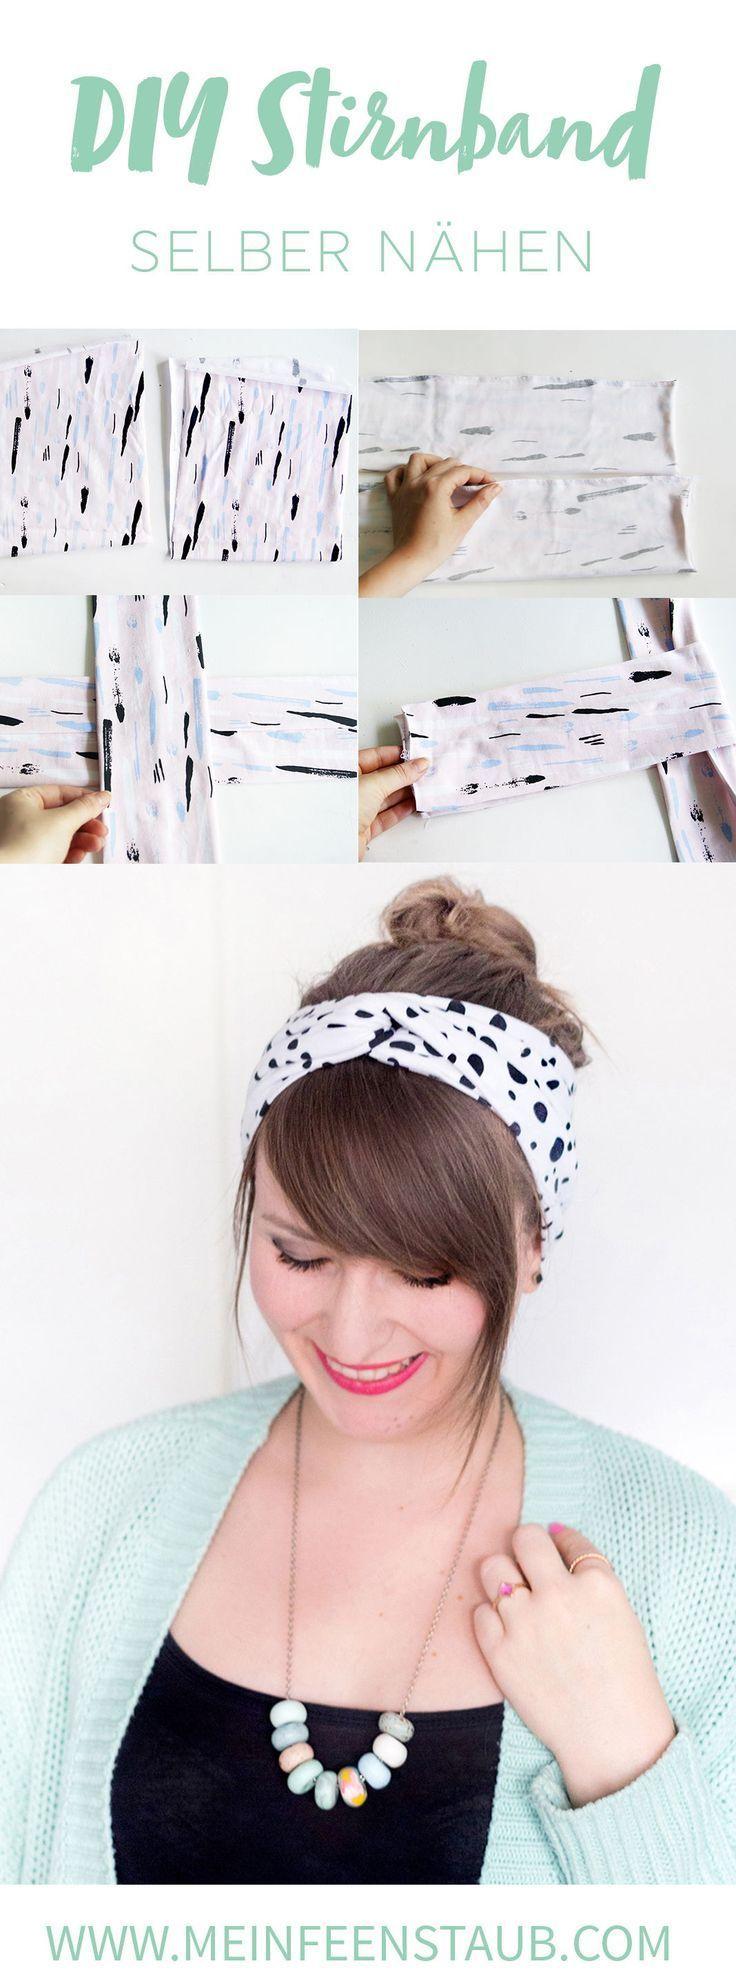 DIY: Turban Stirnband nähen